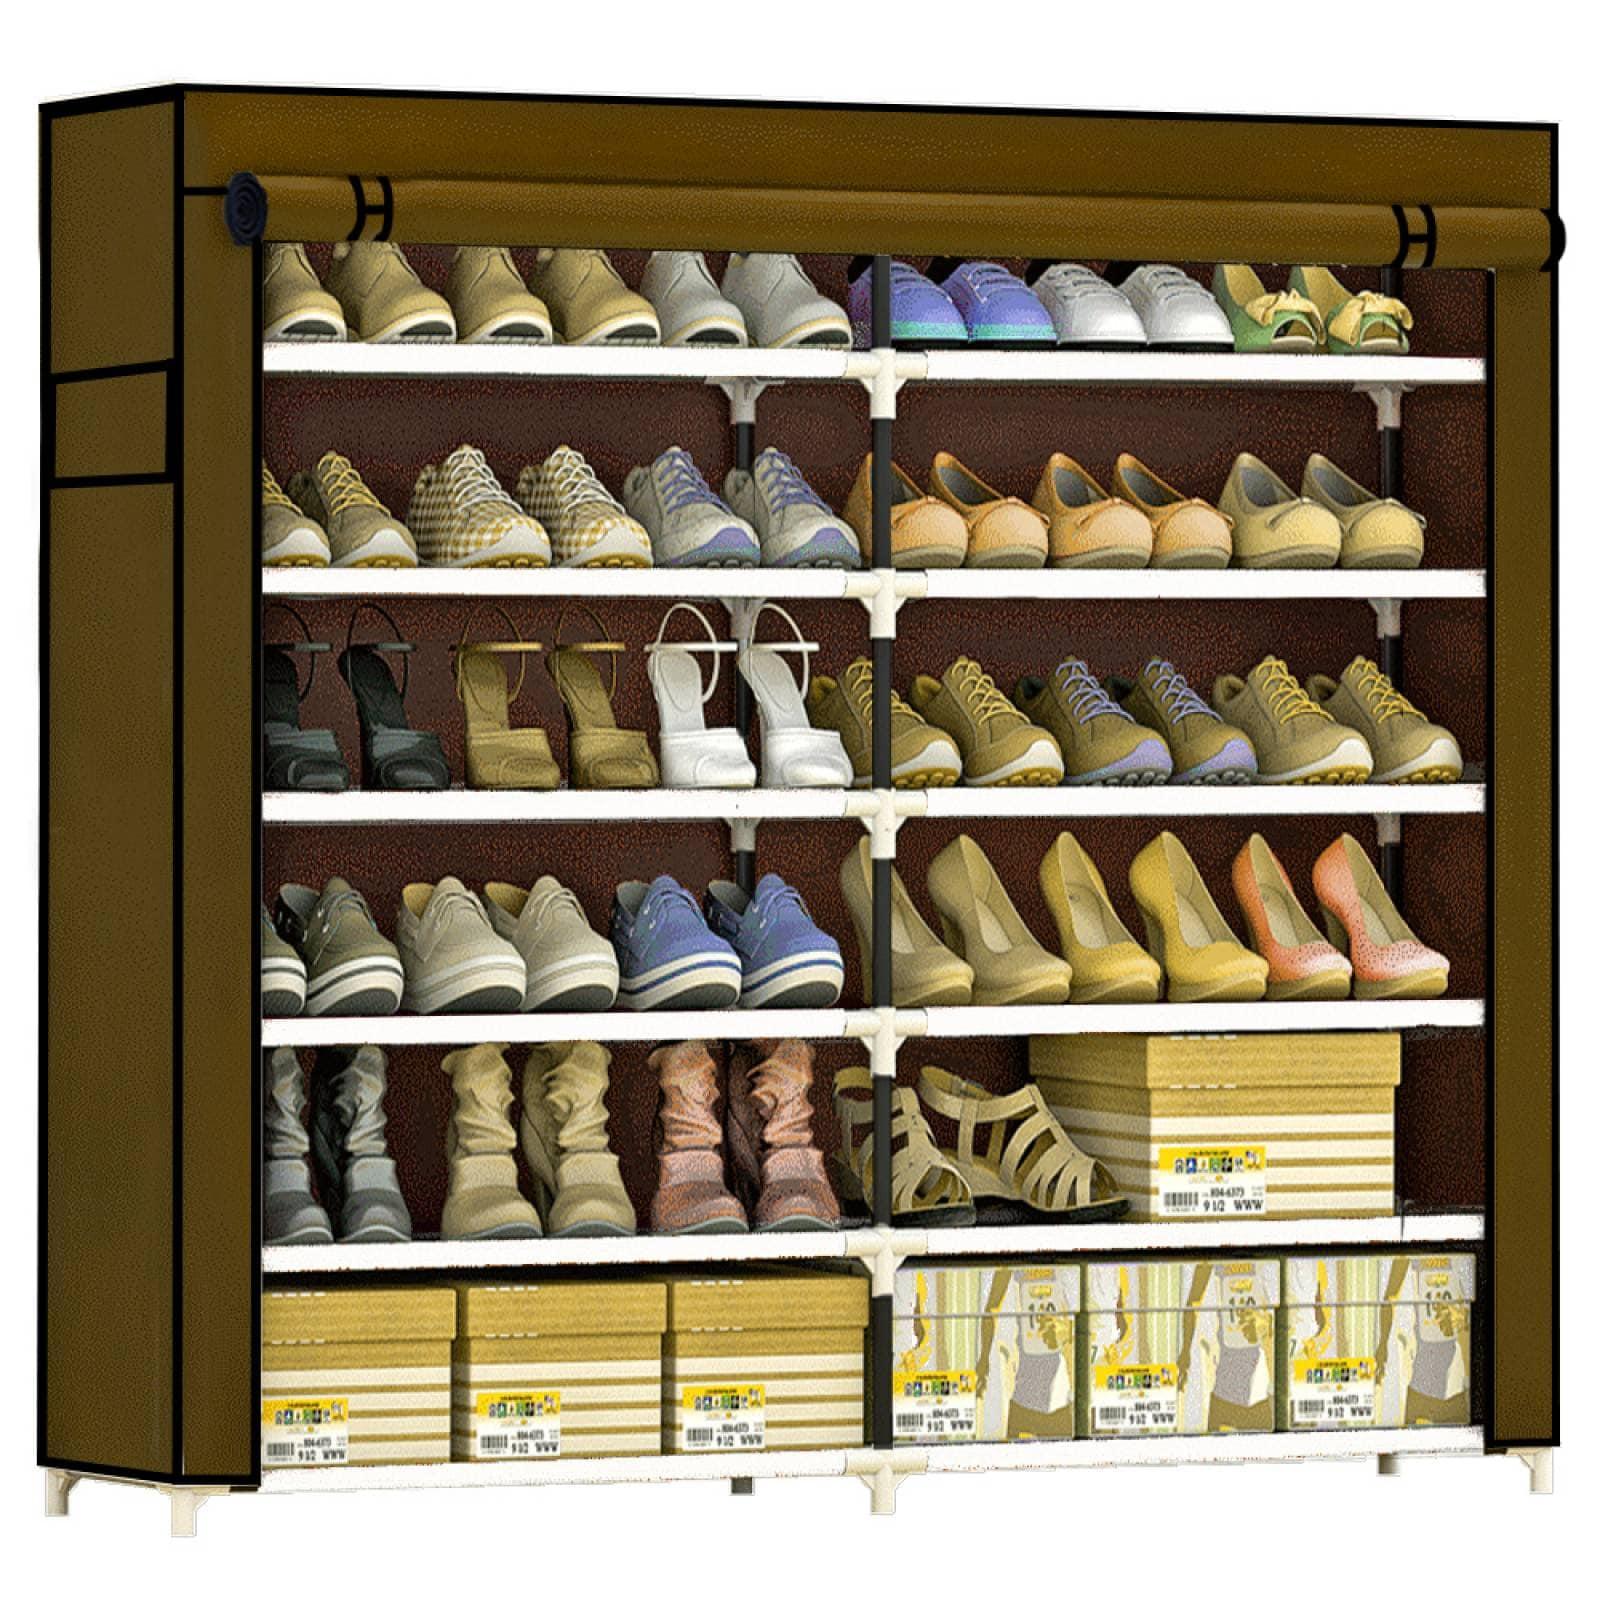 Zapatera Closet Organizador Zapatos 36 Pares Compartimientos Ropa Cafe